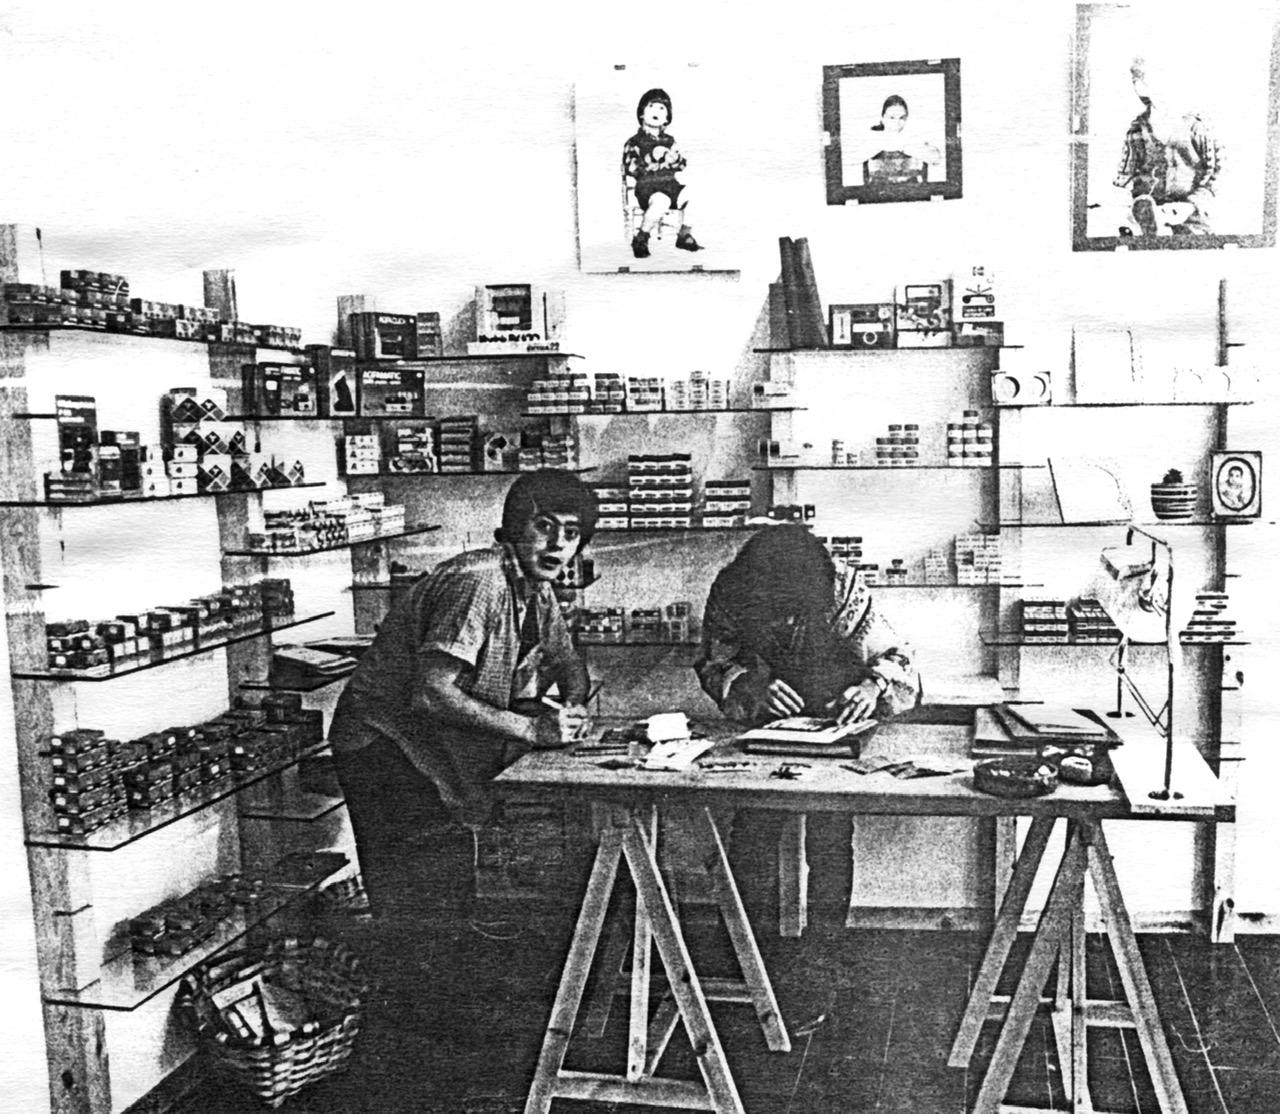 ikatz-primera-tienda-fotografia